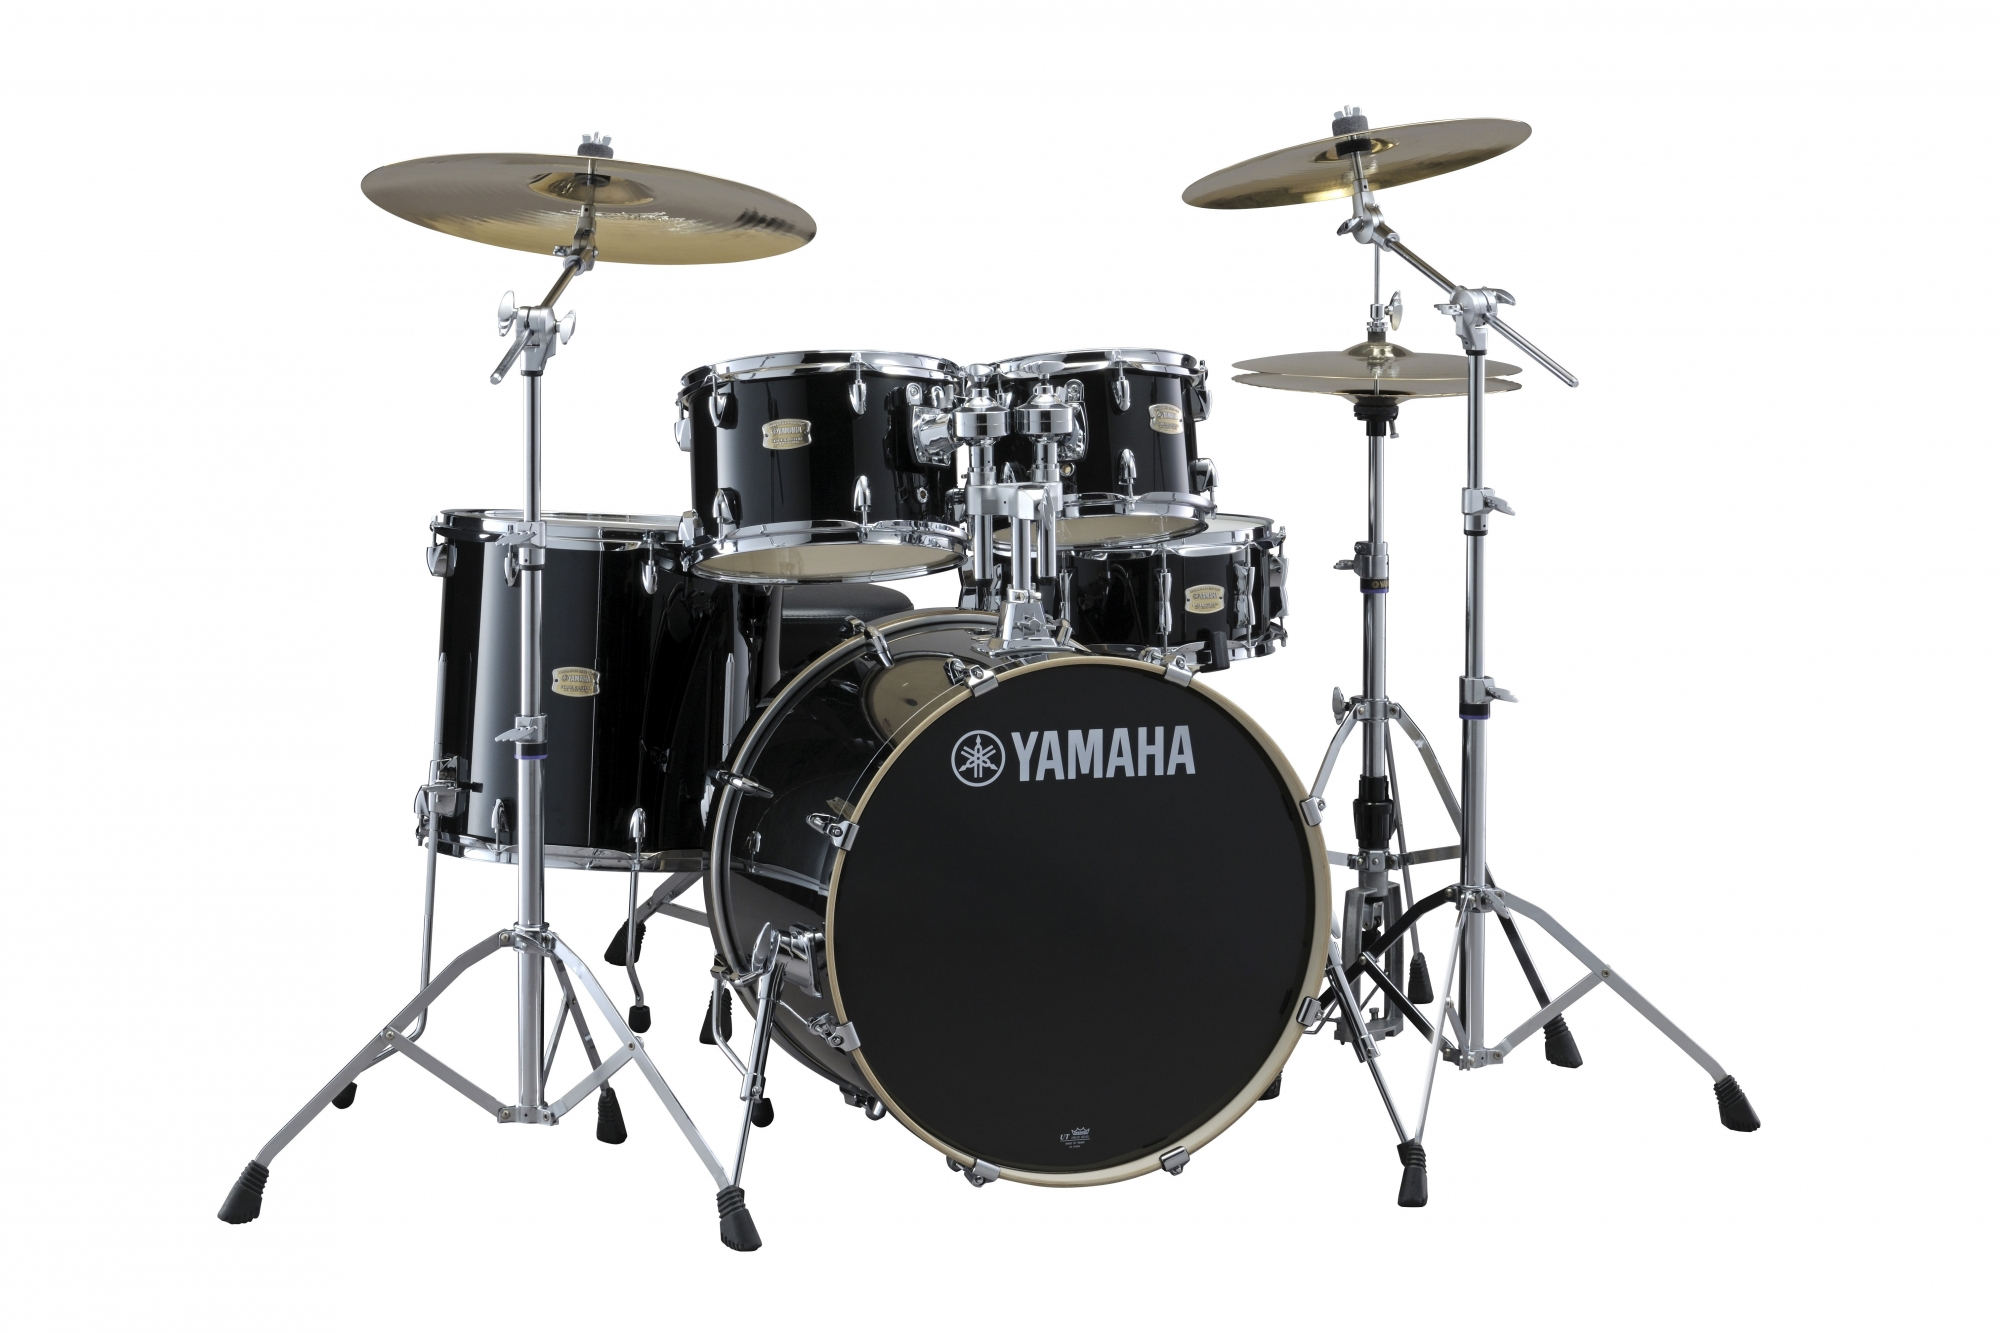 Yamaha Stage Custom Birch Studio Trommesæt Raven Black